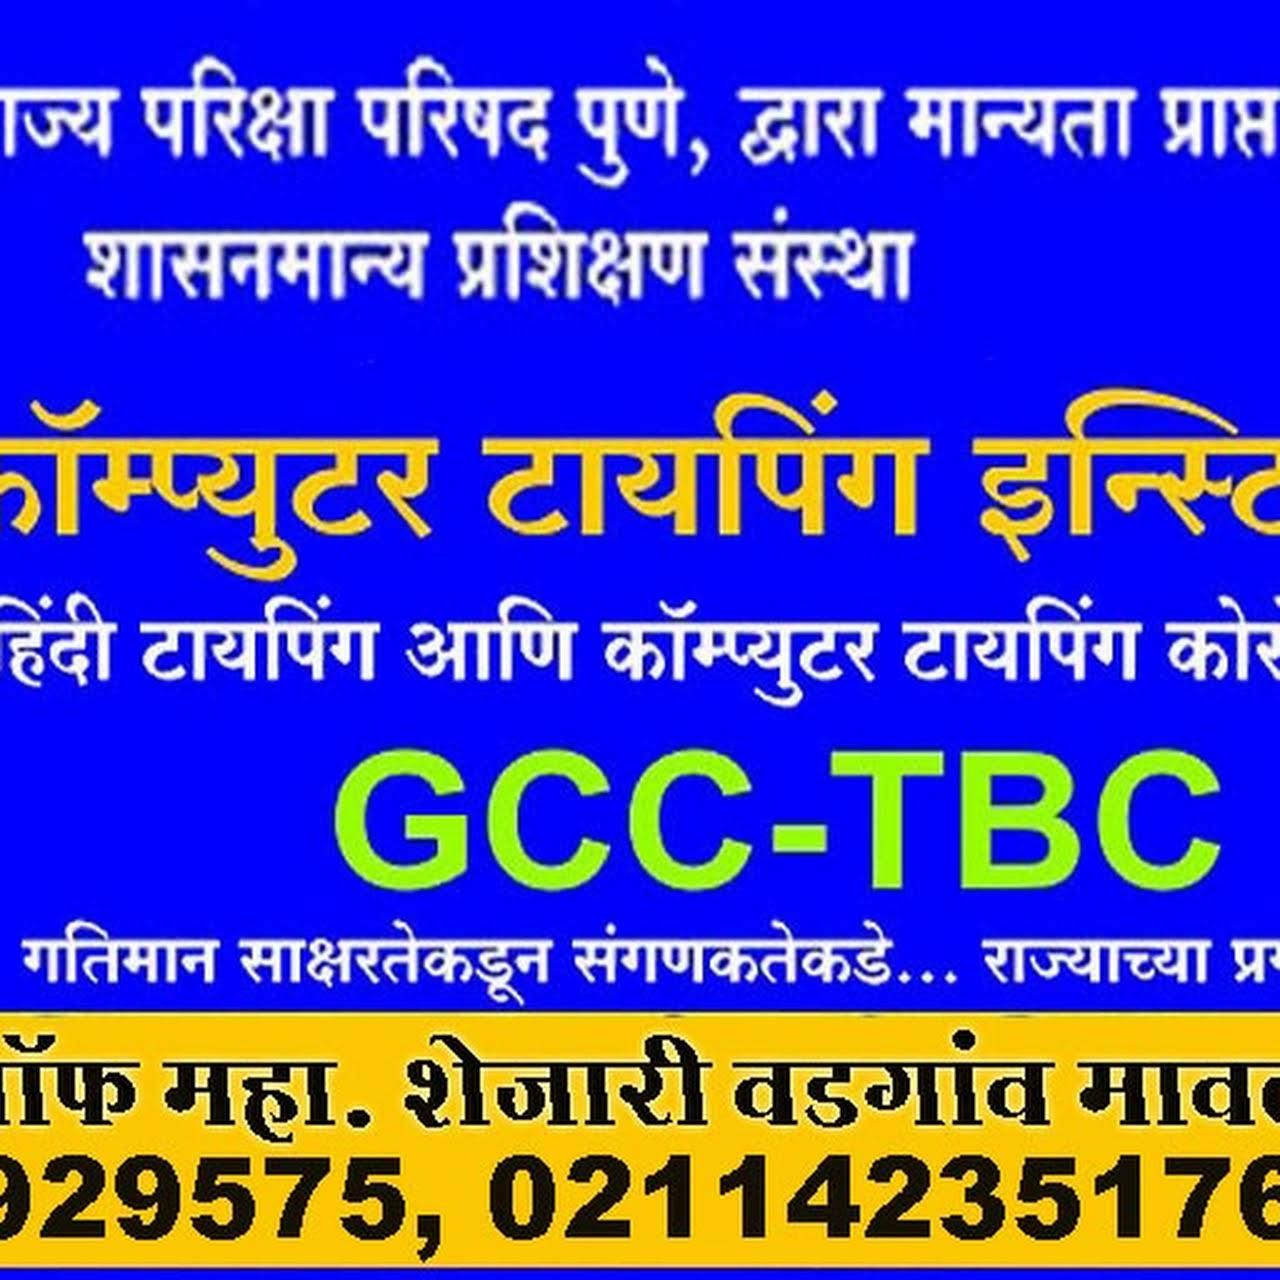 Top Five Gcc Tbc - Circus